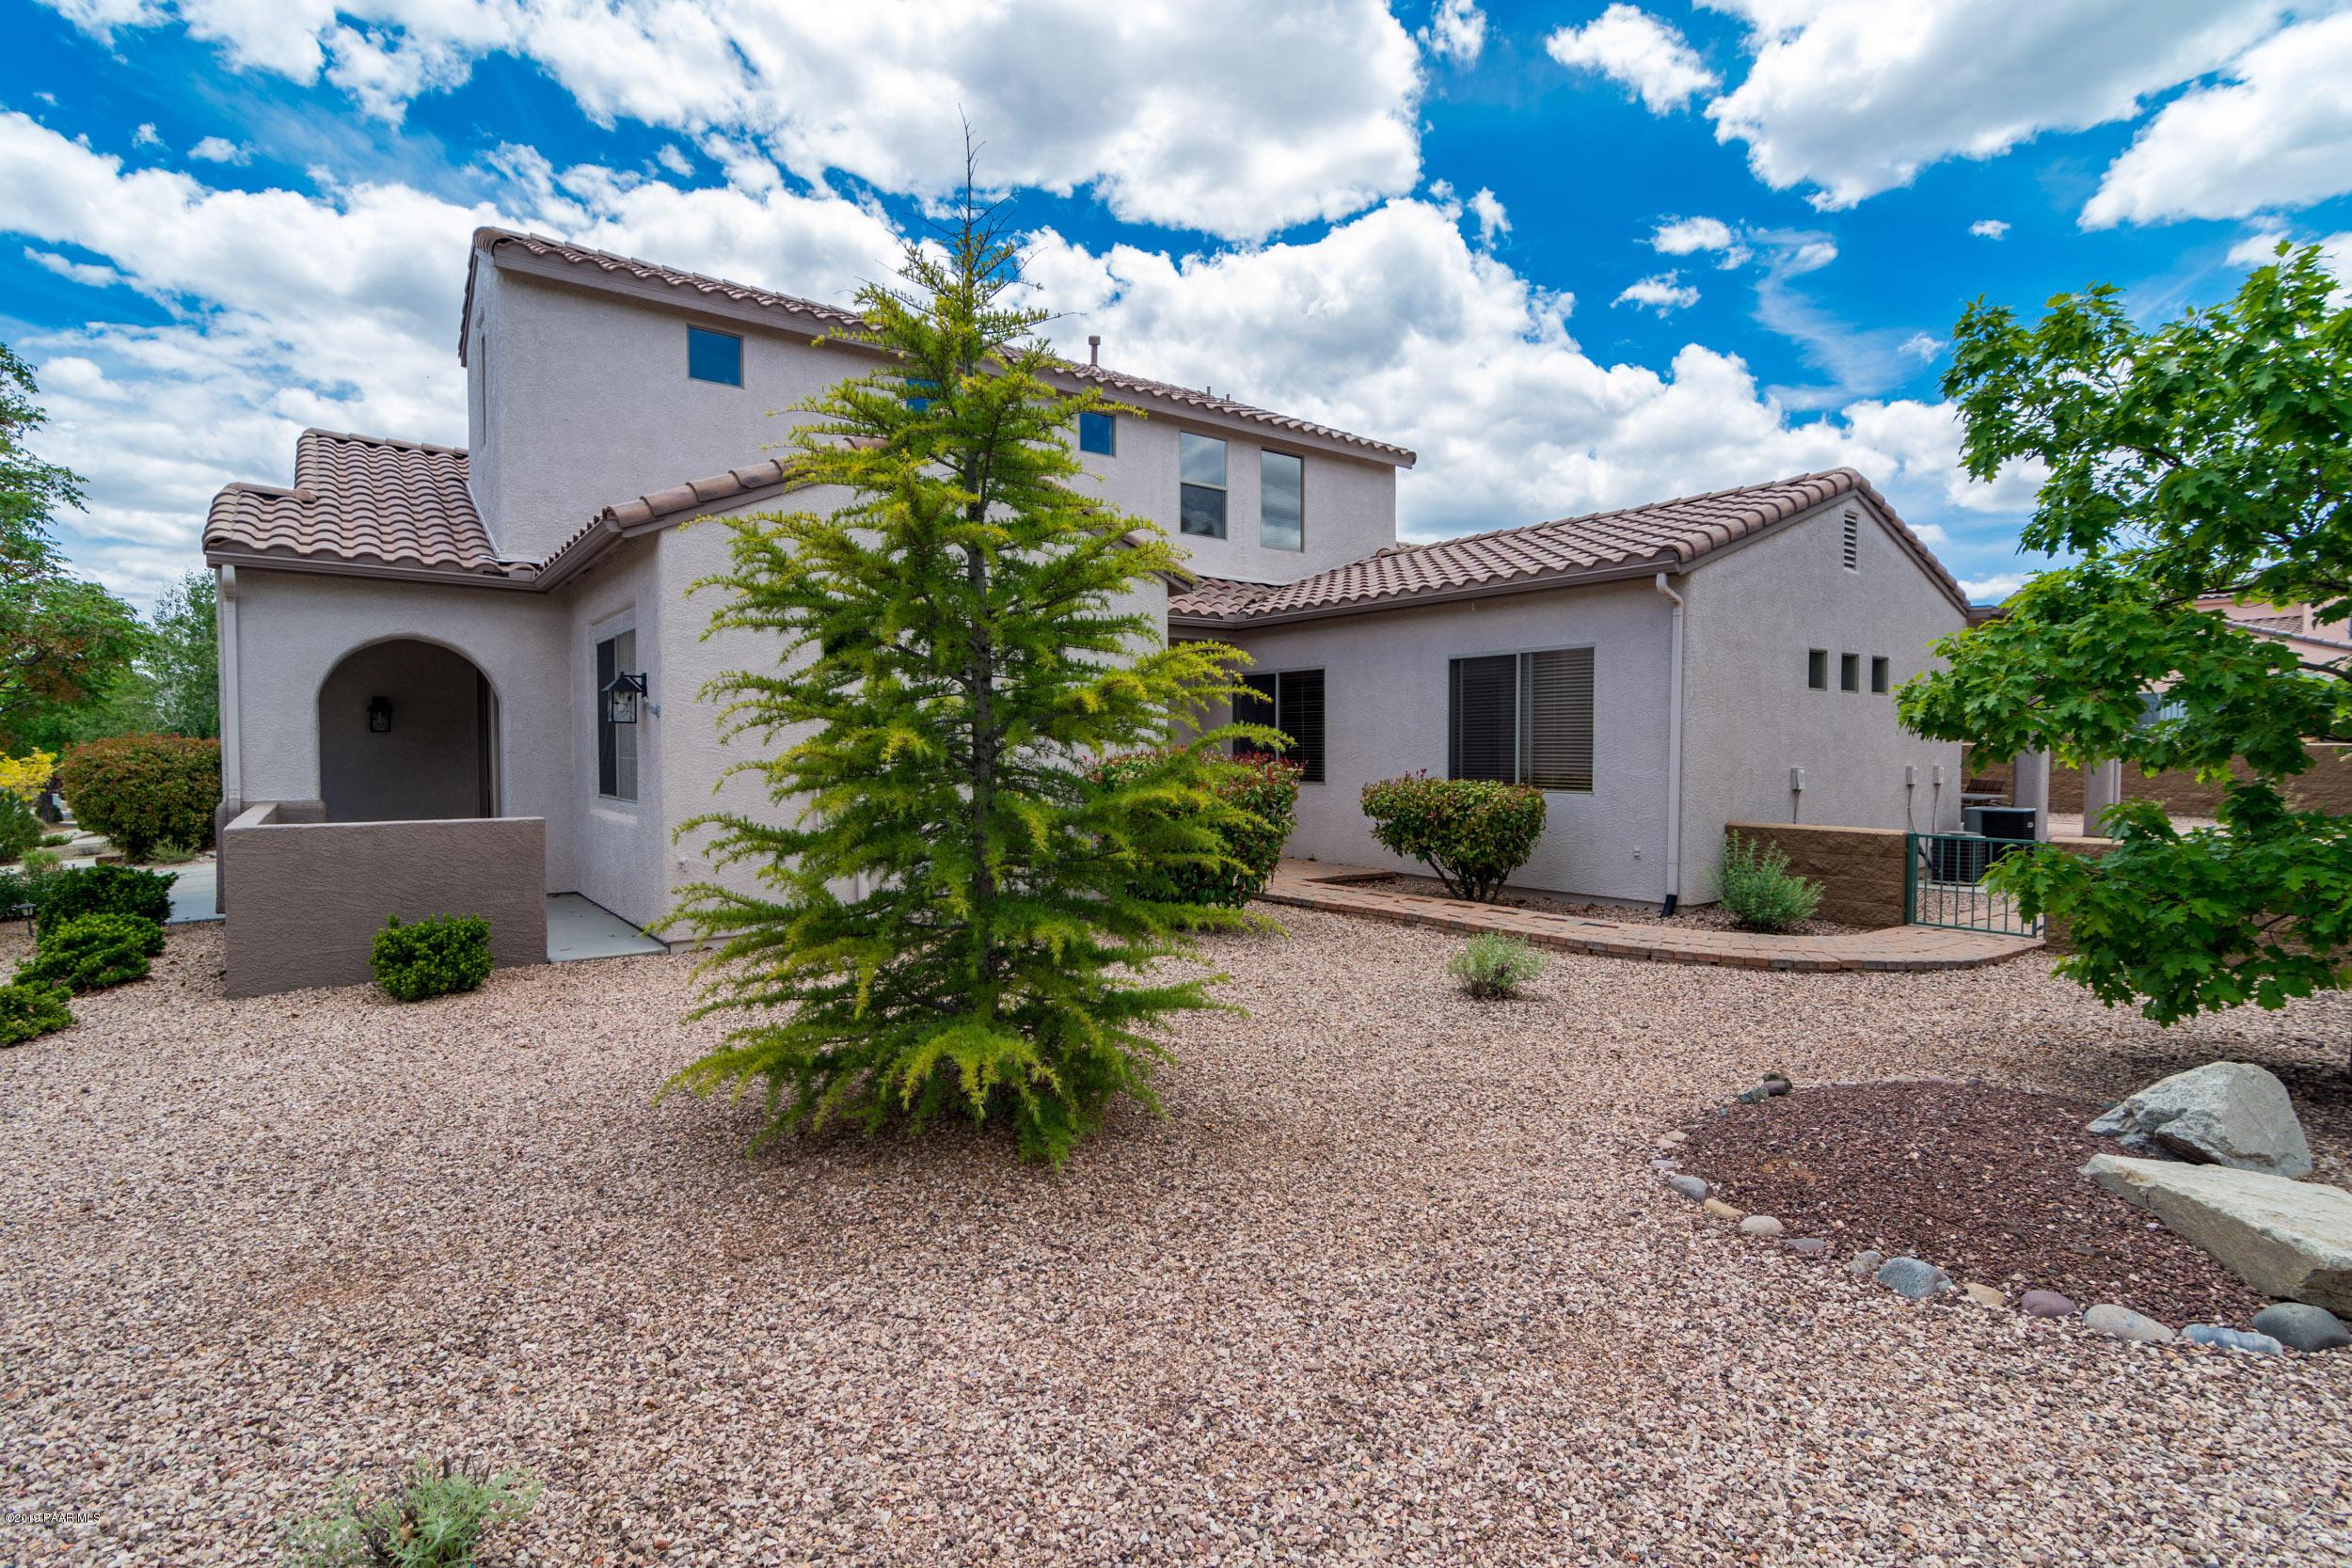 Photo of 7183 Slow Draw, Prescott Valley, AZ 86314